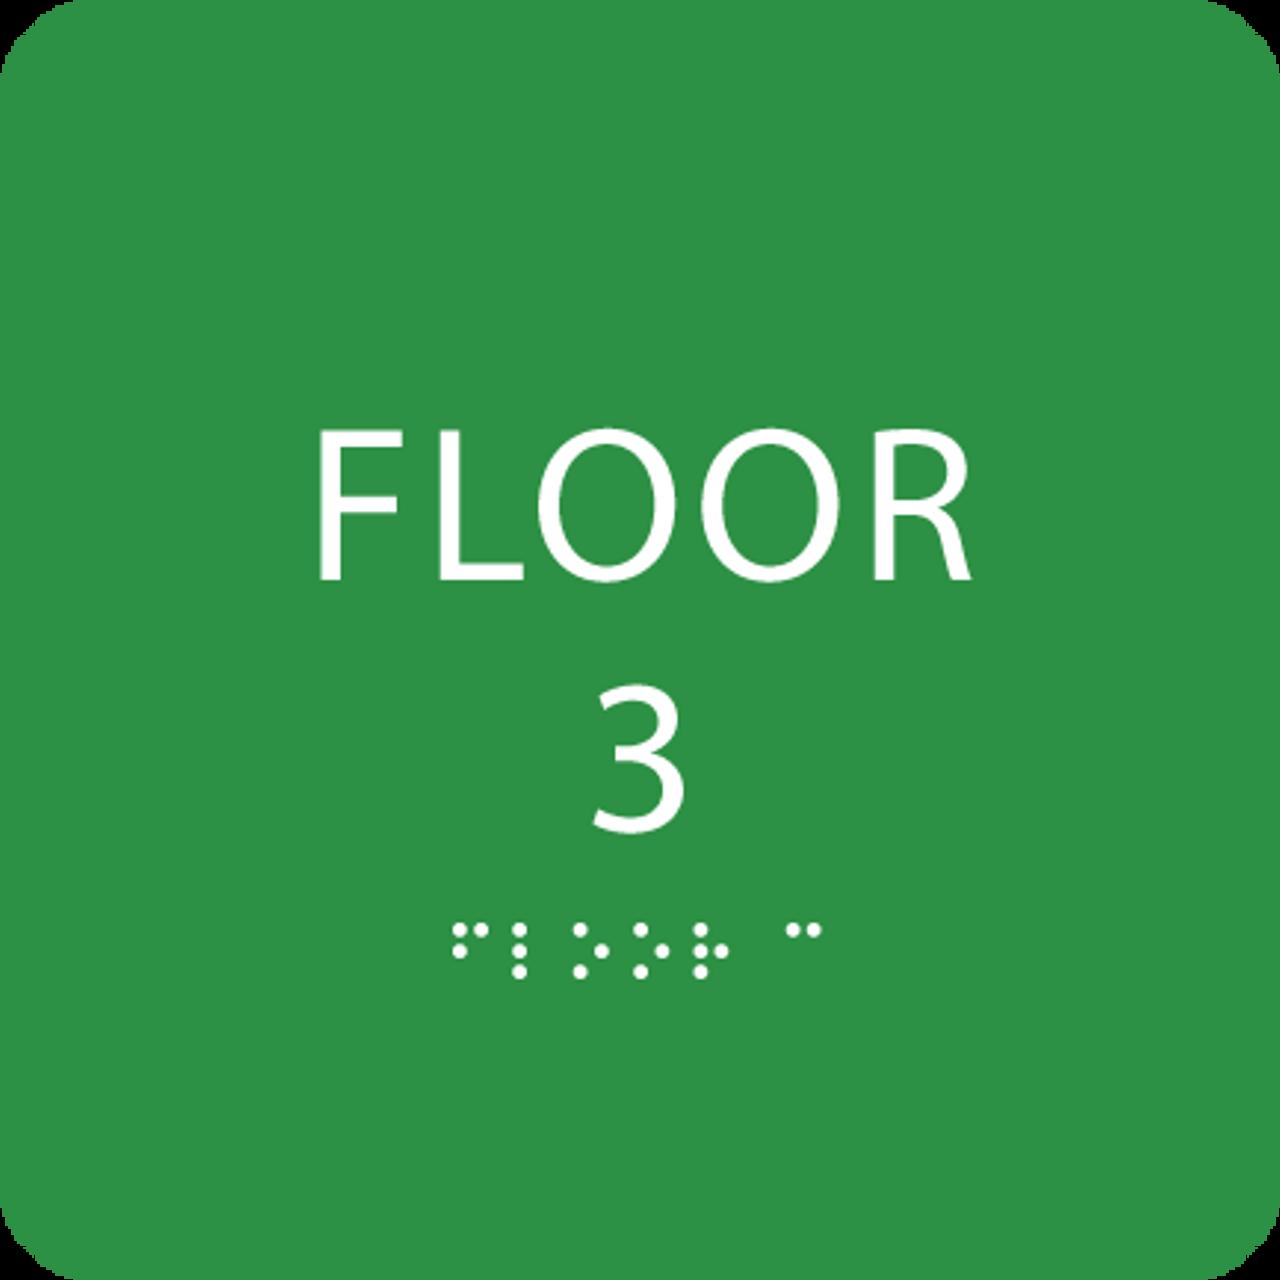 Green Floor 3 Identification Sign